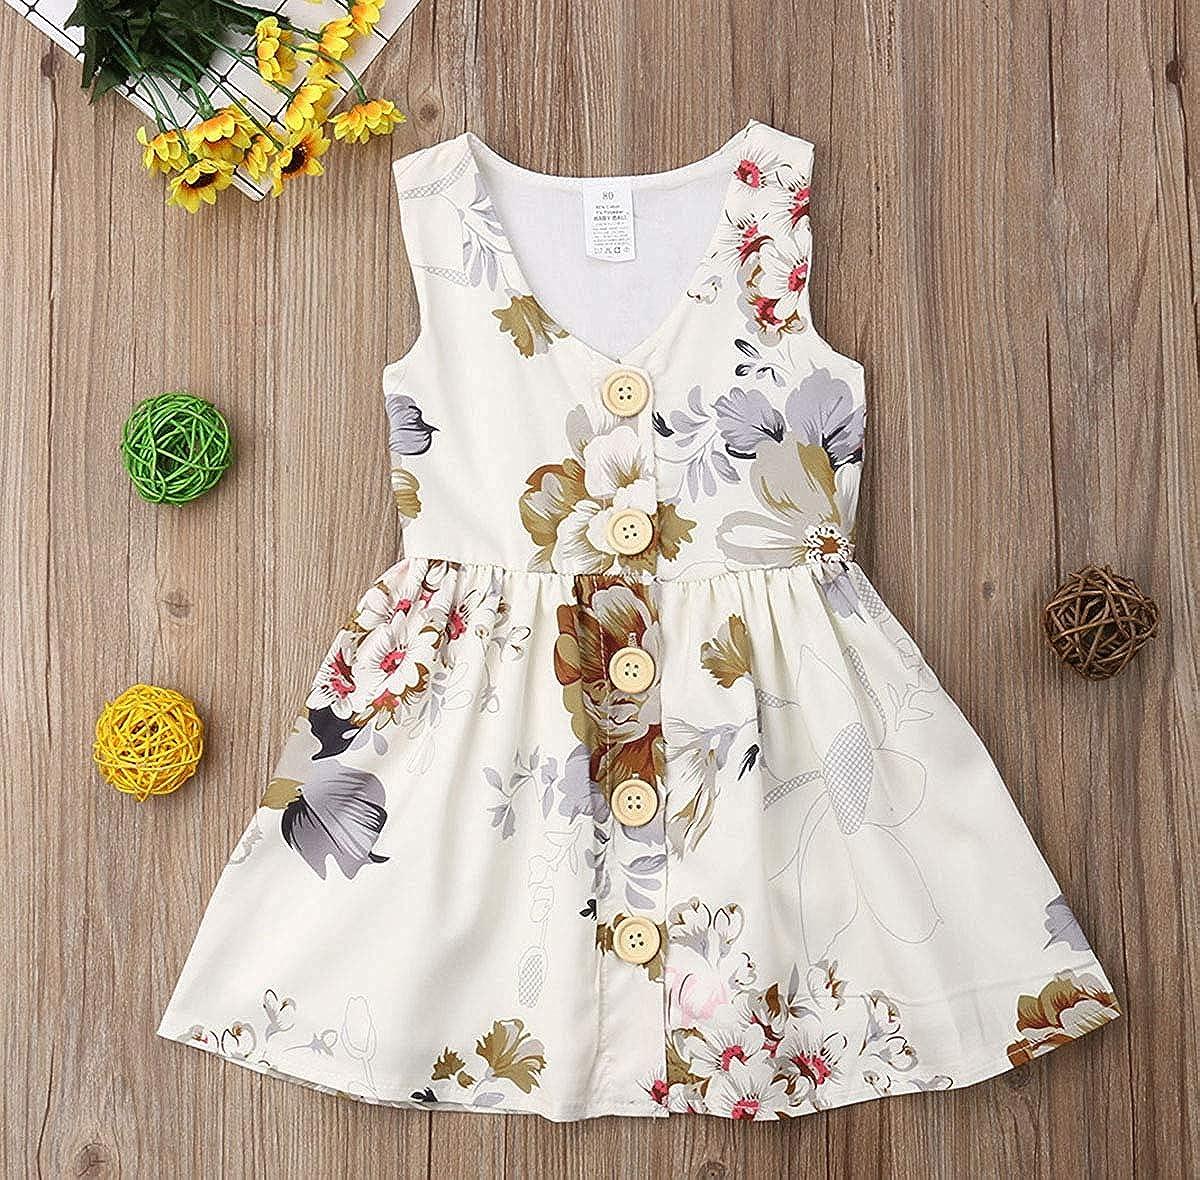 TM Toddler Kids Baby Girl Summer Beach Playwear Dress Stripe Lace Party Pageant Princess Dresses Jchen for 0-5 T Girls,